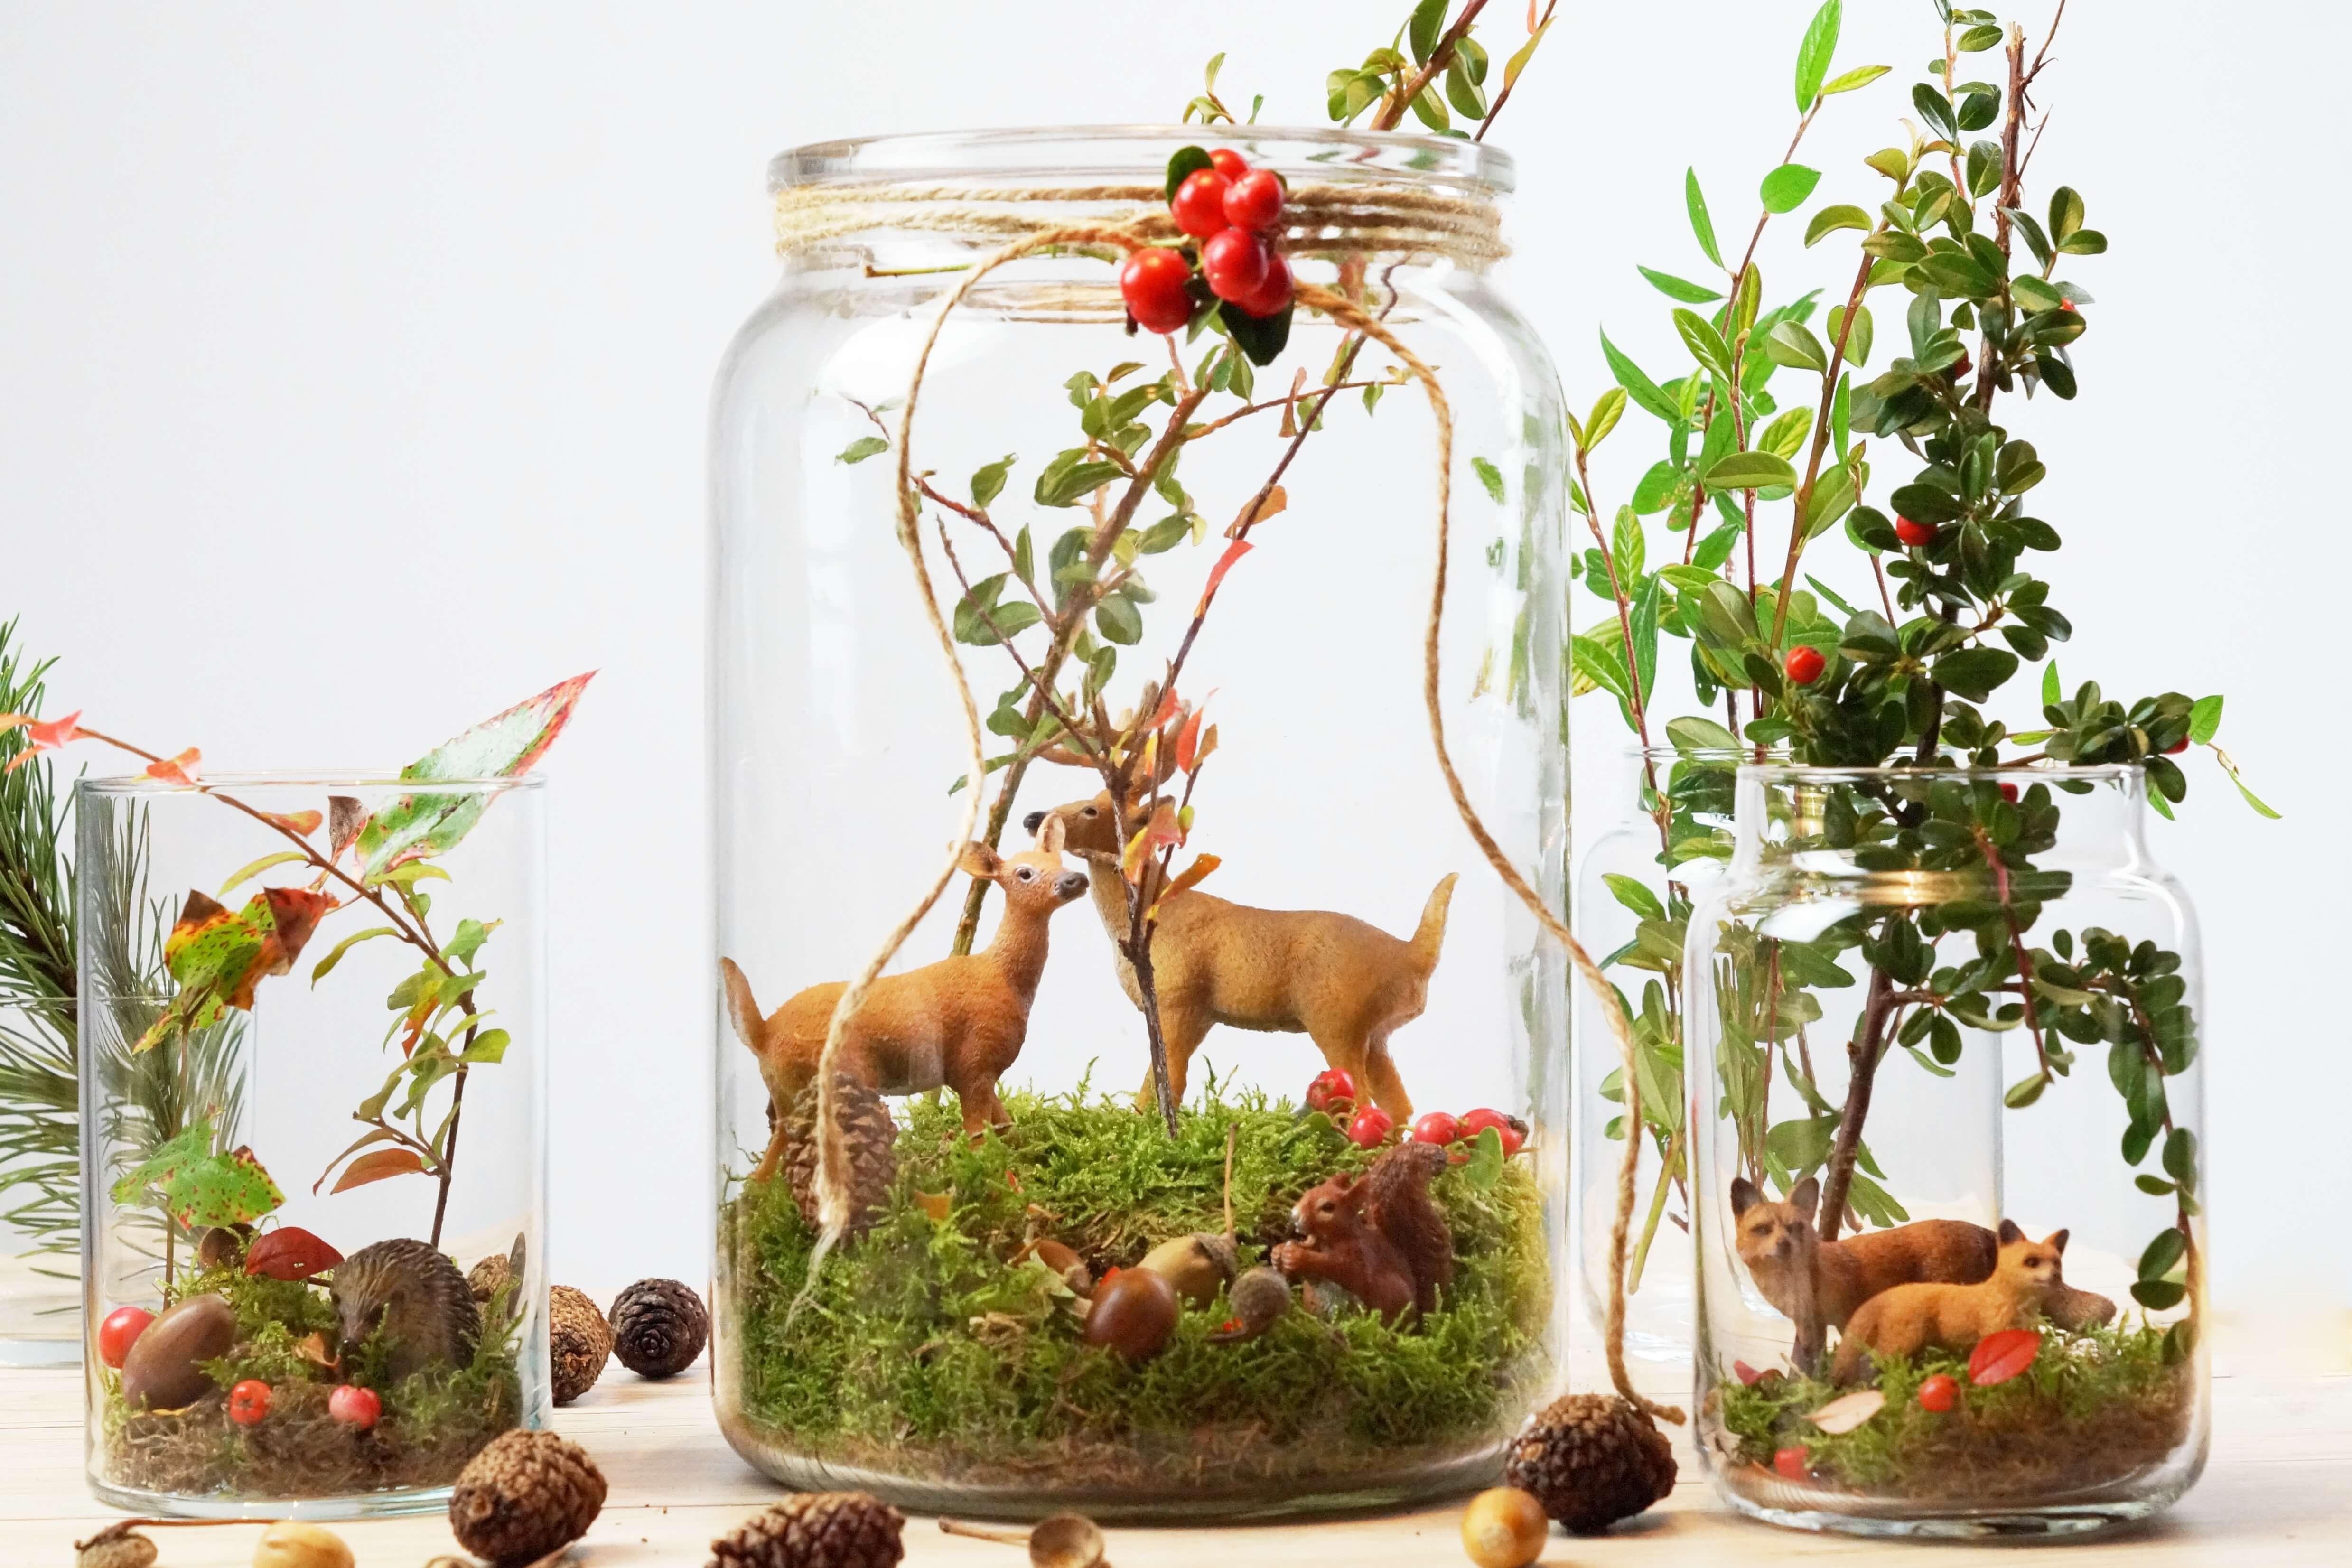 Diy herbstwald im glas tantedine for Herbst dekoration im glas